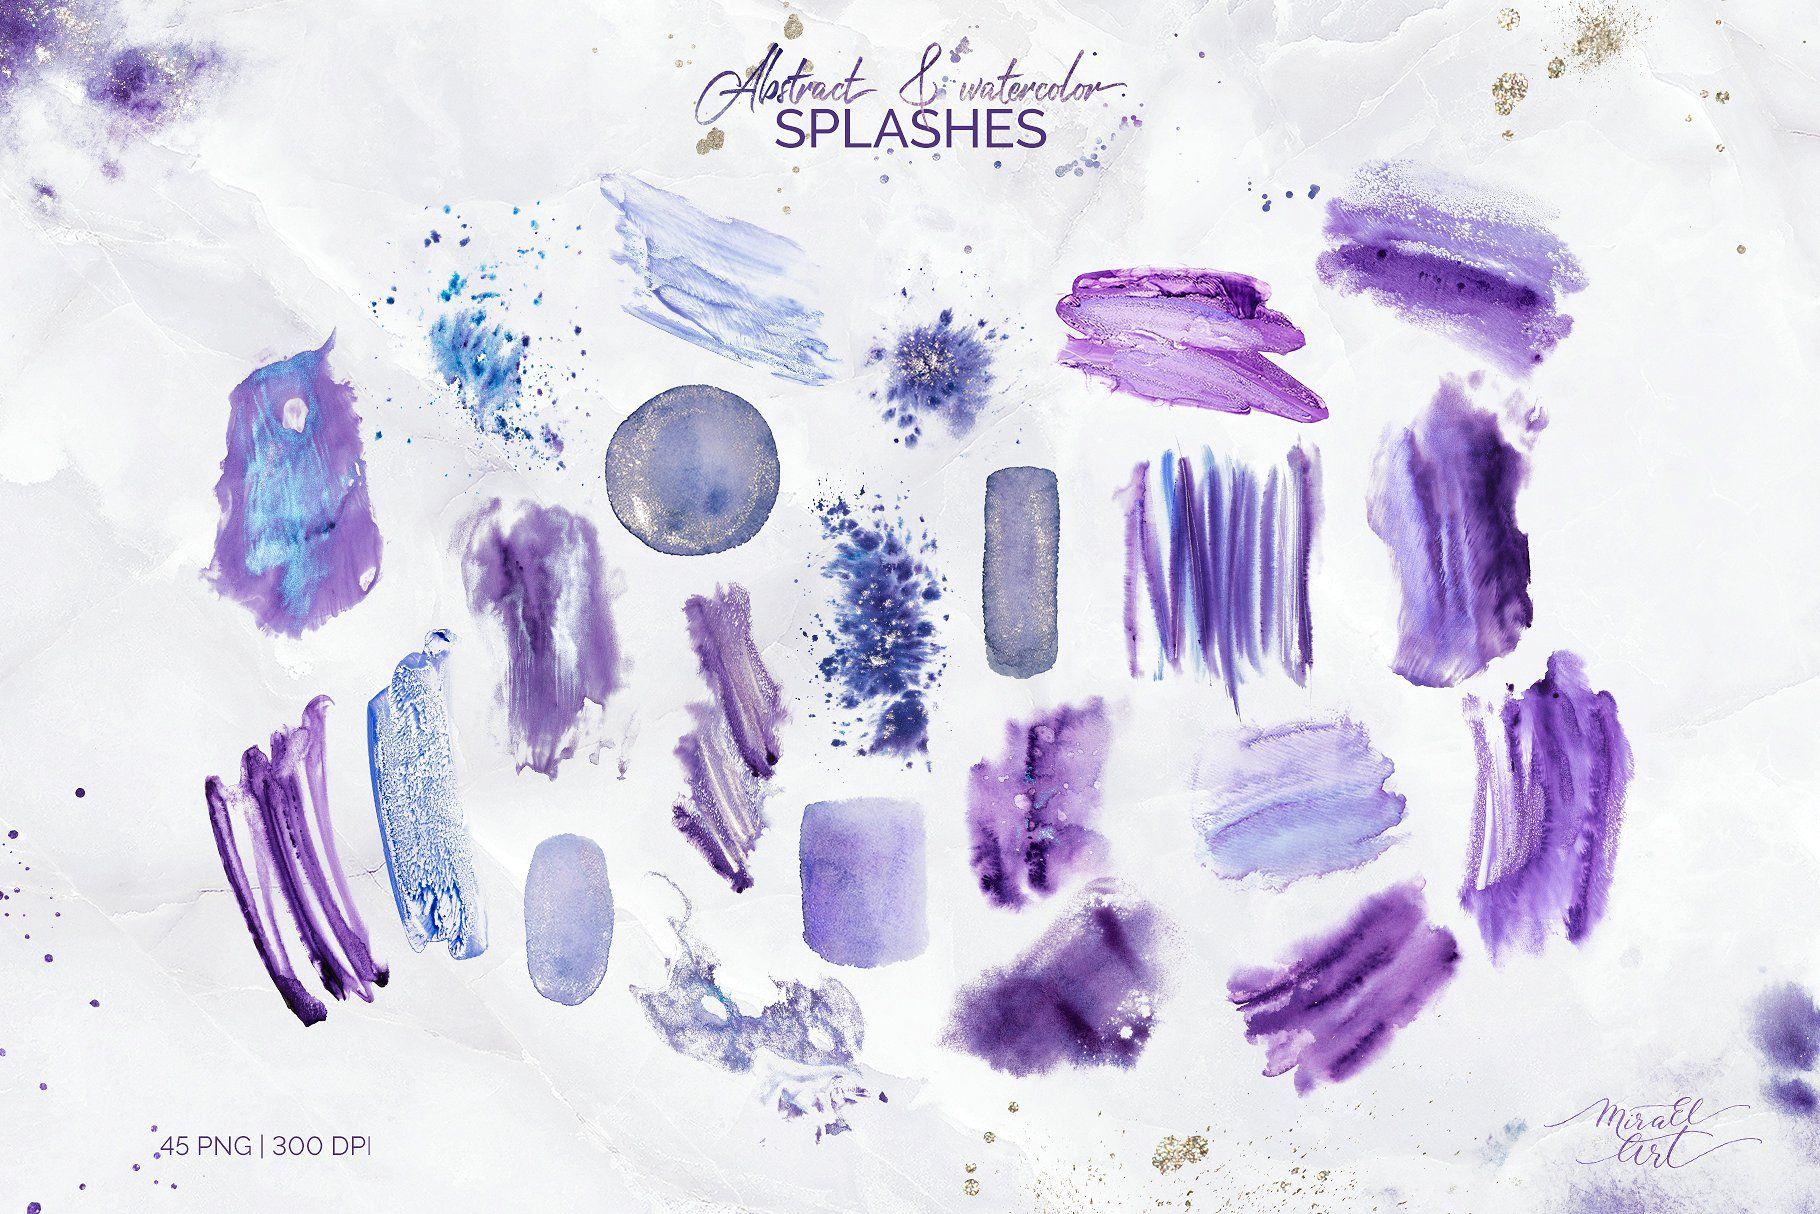 Violet Aura Watercolor Design Kit Watercolor Splash Png Watercolor Design Watercolor Splash